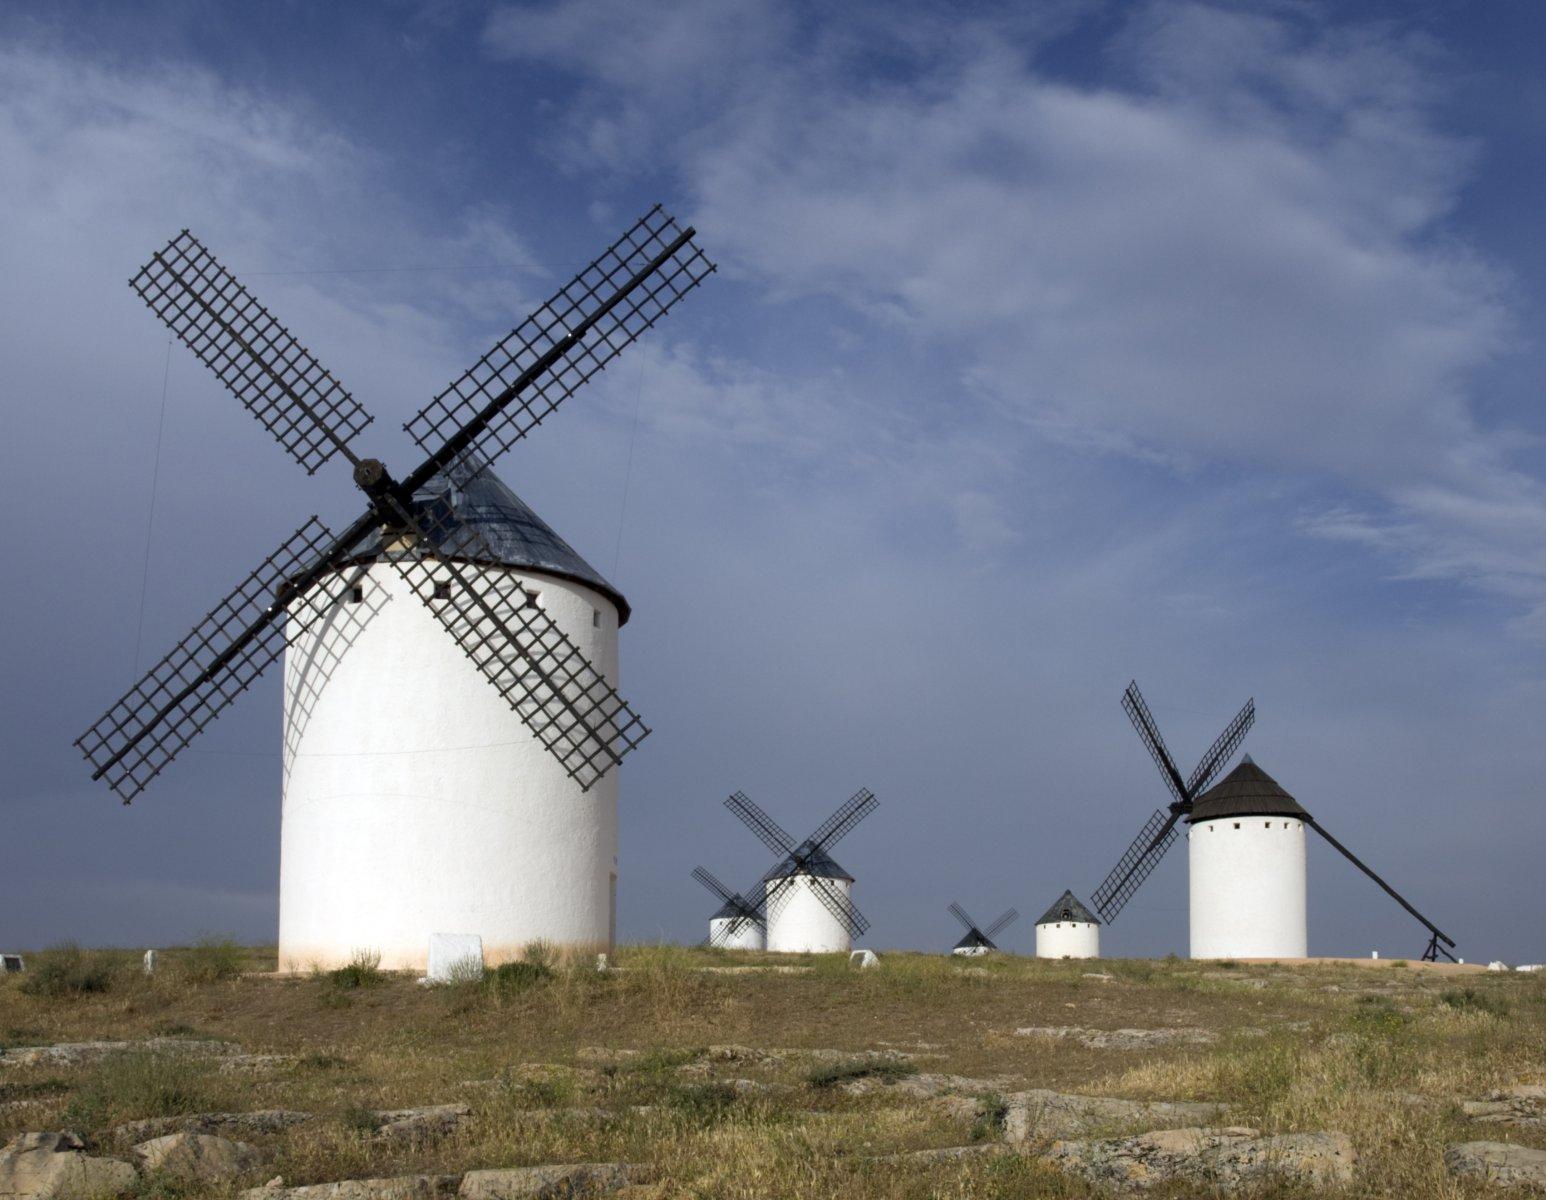 Windmills on La Mancha, Spain